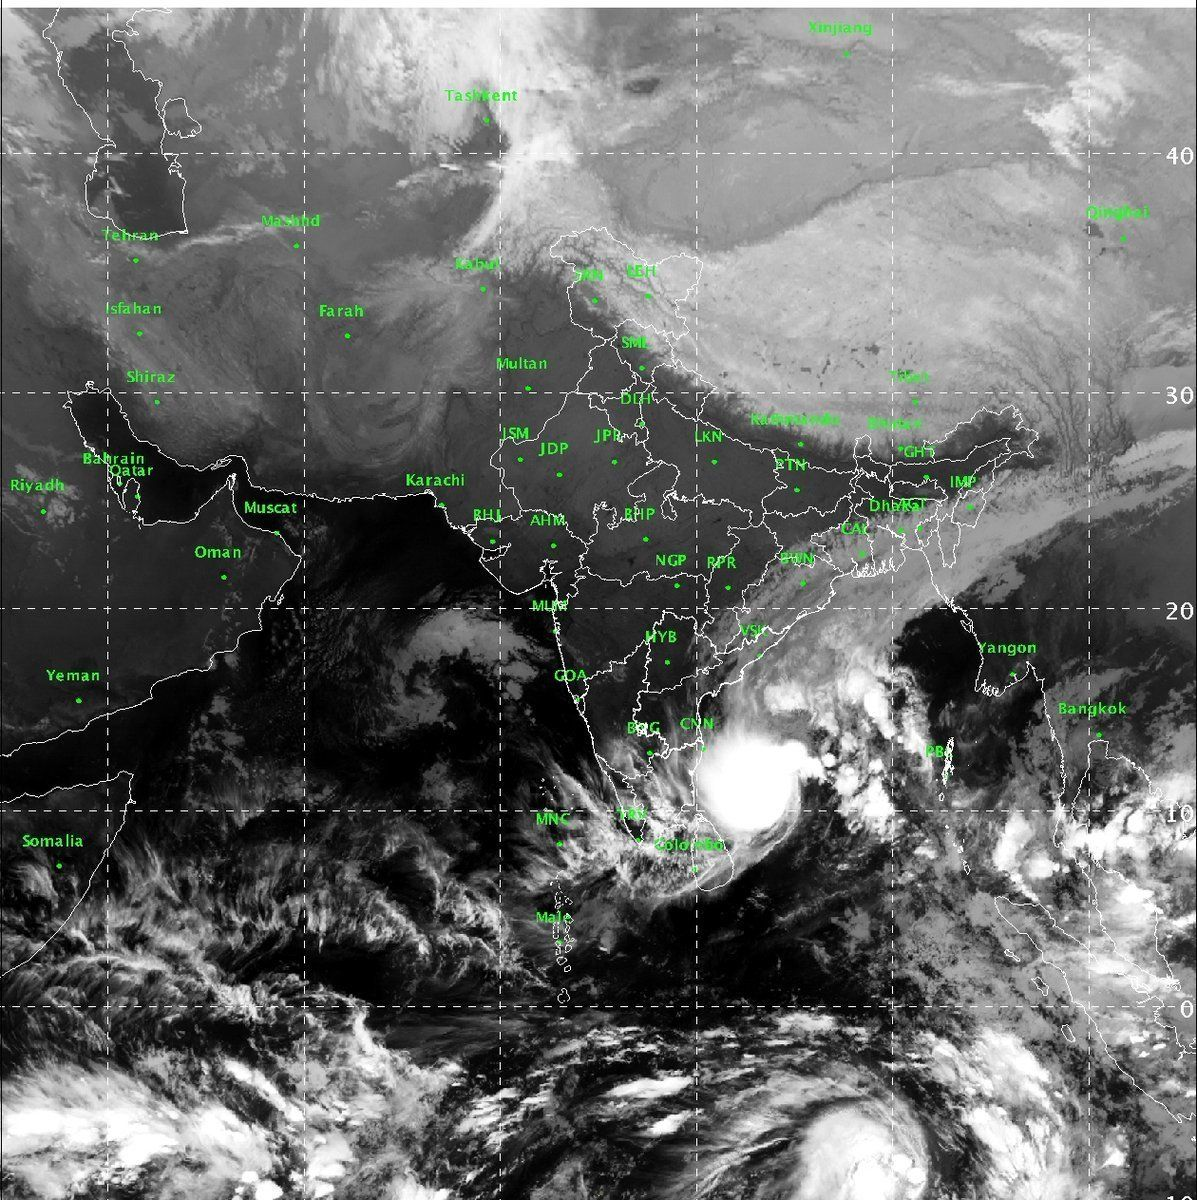 Cyclone Phethai To Make Landfall Today, Andhra Pradesh on High